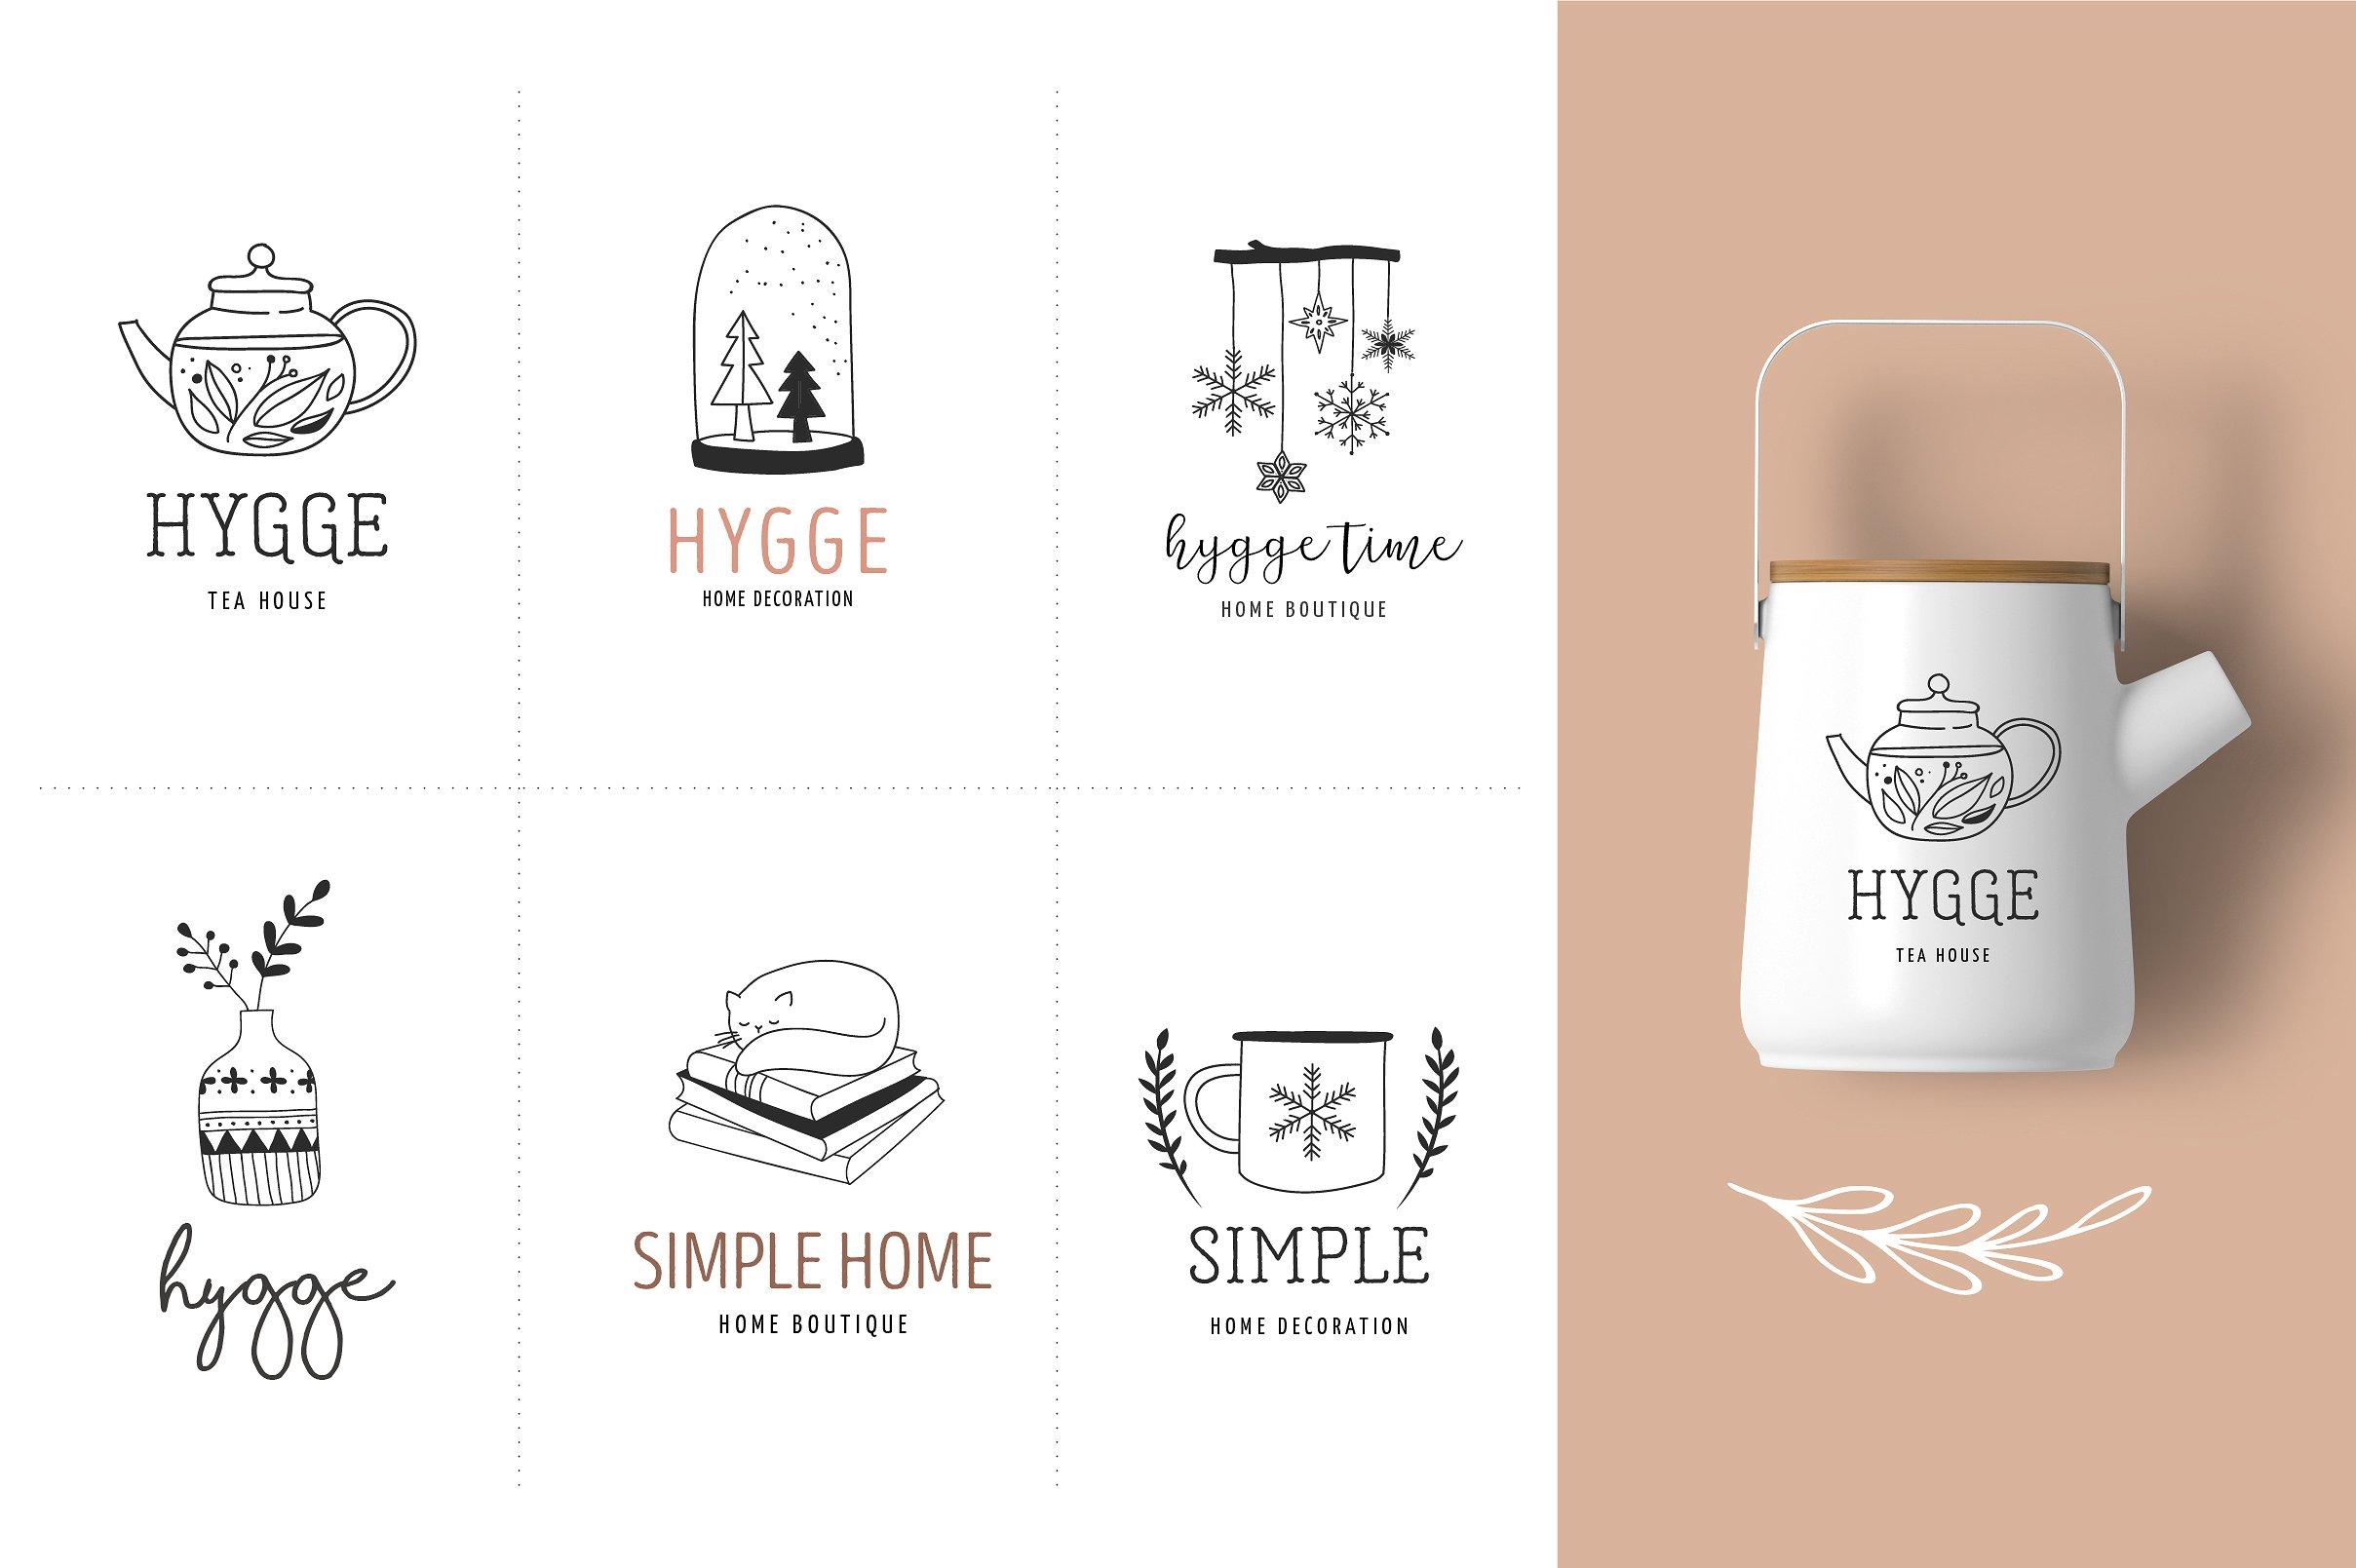 hygge-logos-05-.jpg